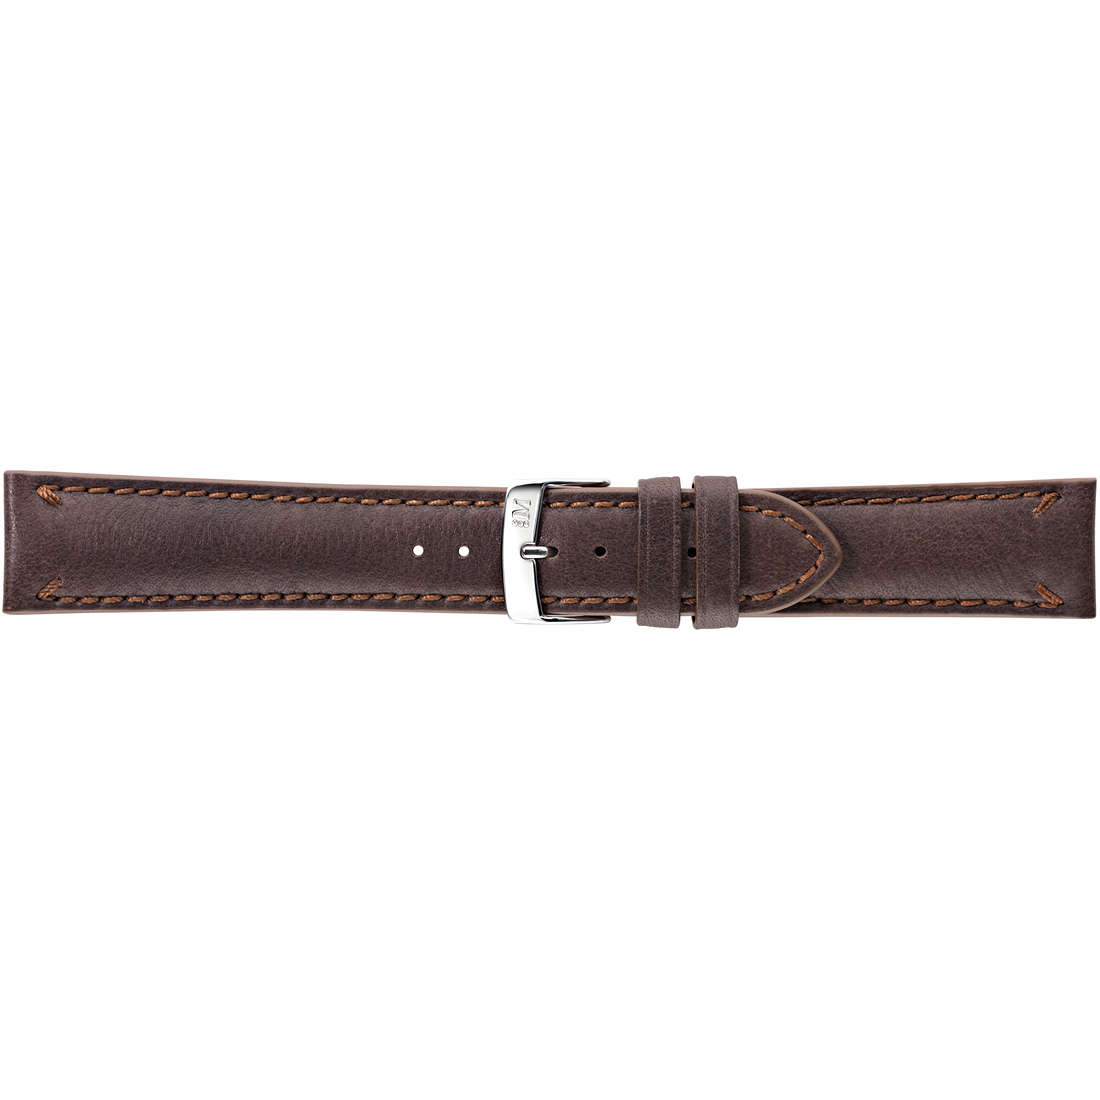 montre bande de montres homme Morellato Manufatti A01X4540A61030CR22